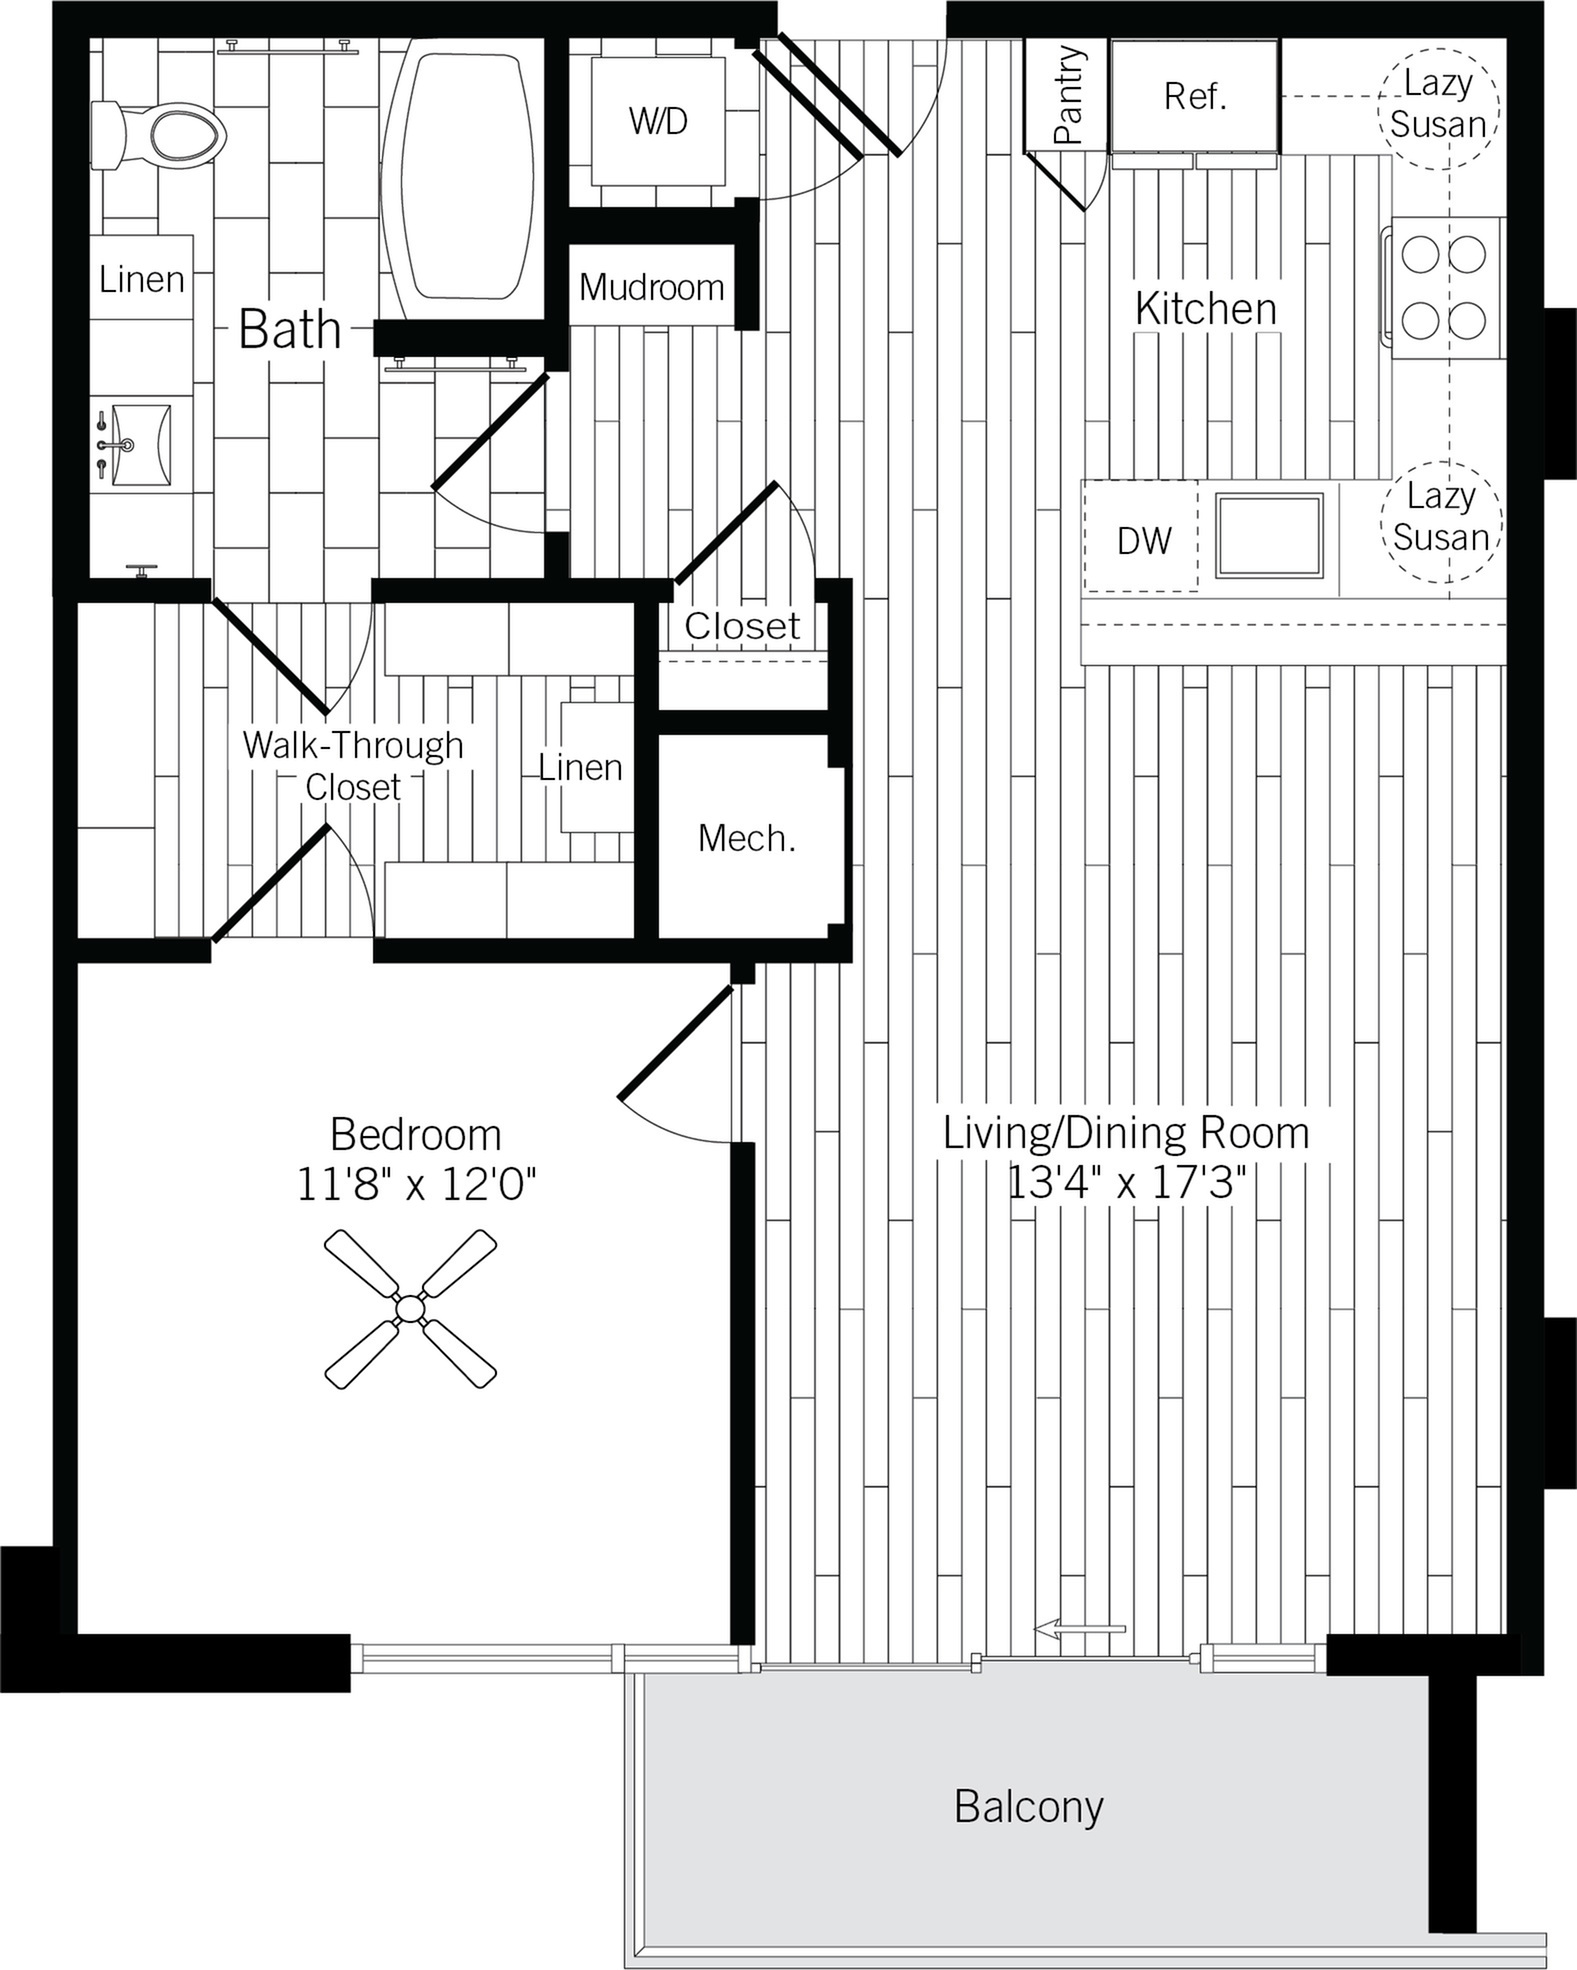 787 square foot one bedroom one bath apartment floorplan image